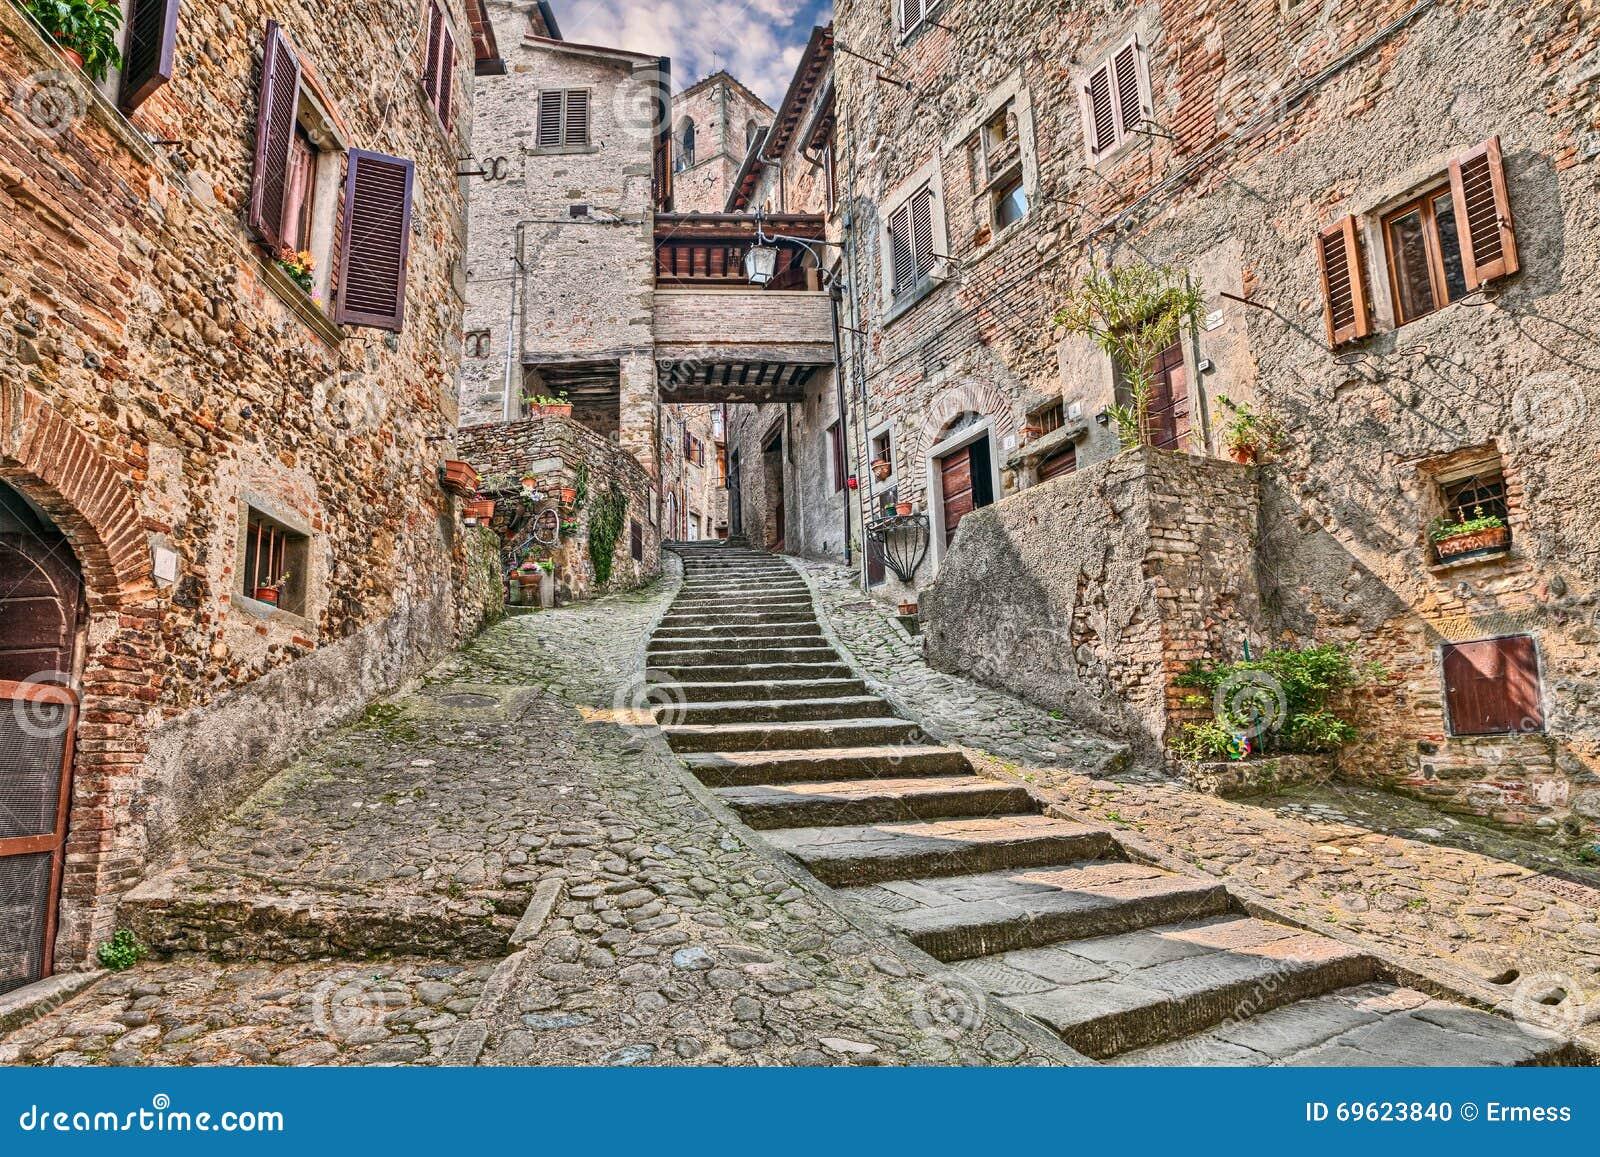 tuscany village wallpaper anghiari - photo #24